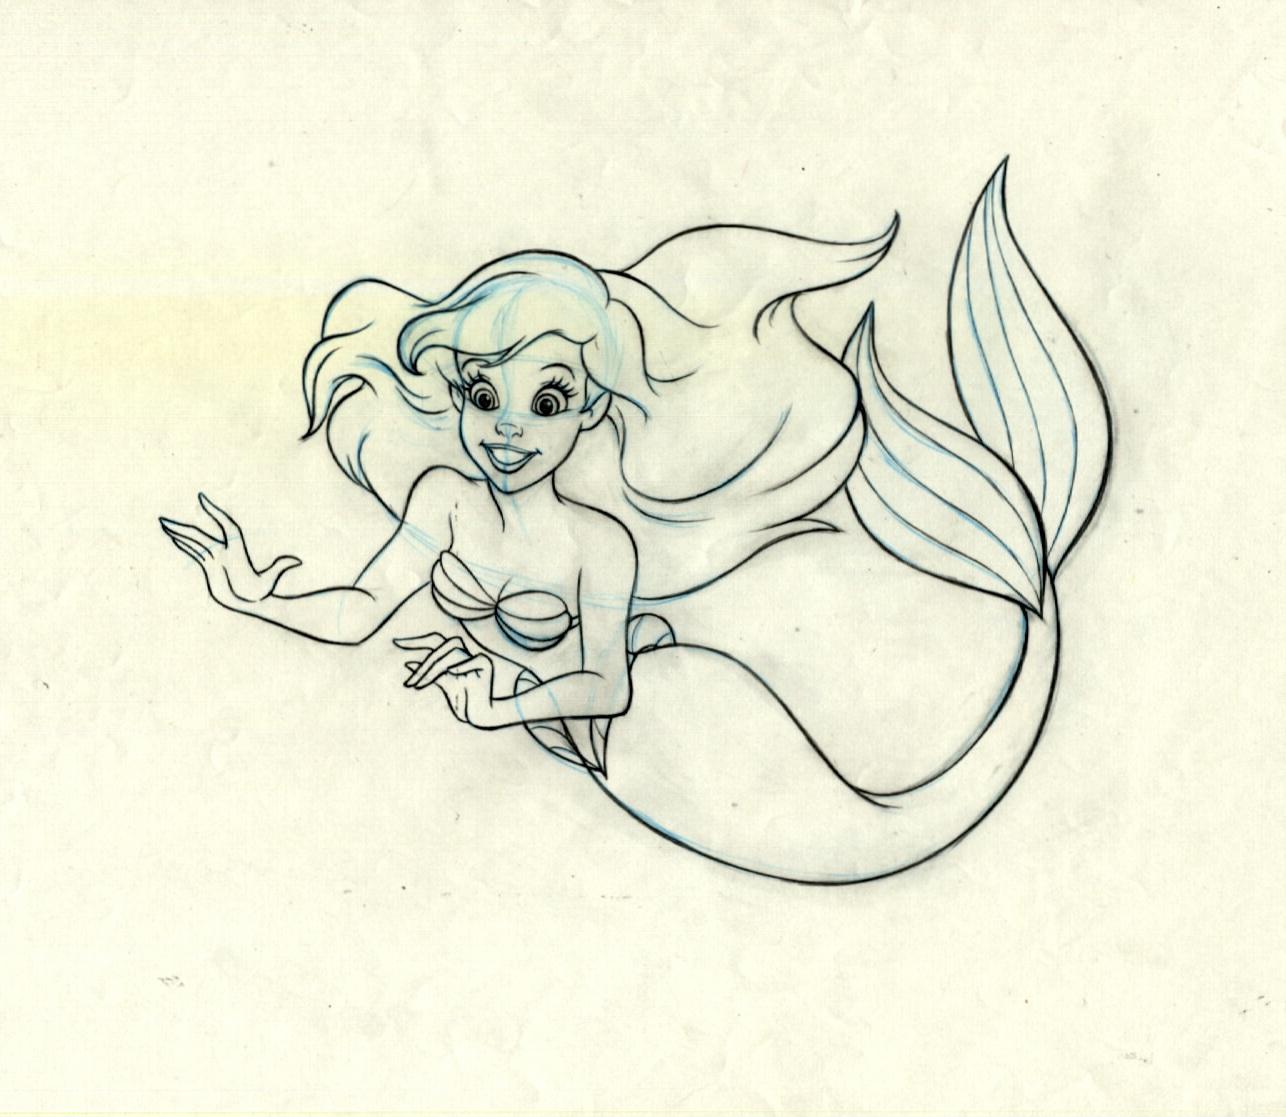 1286x1117 Ariel The Little Mermaid Original Production Drawing